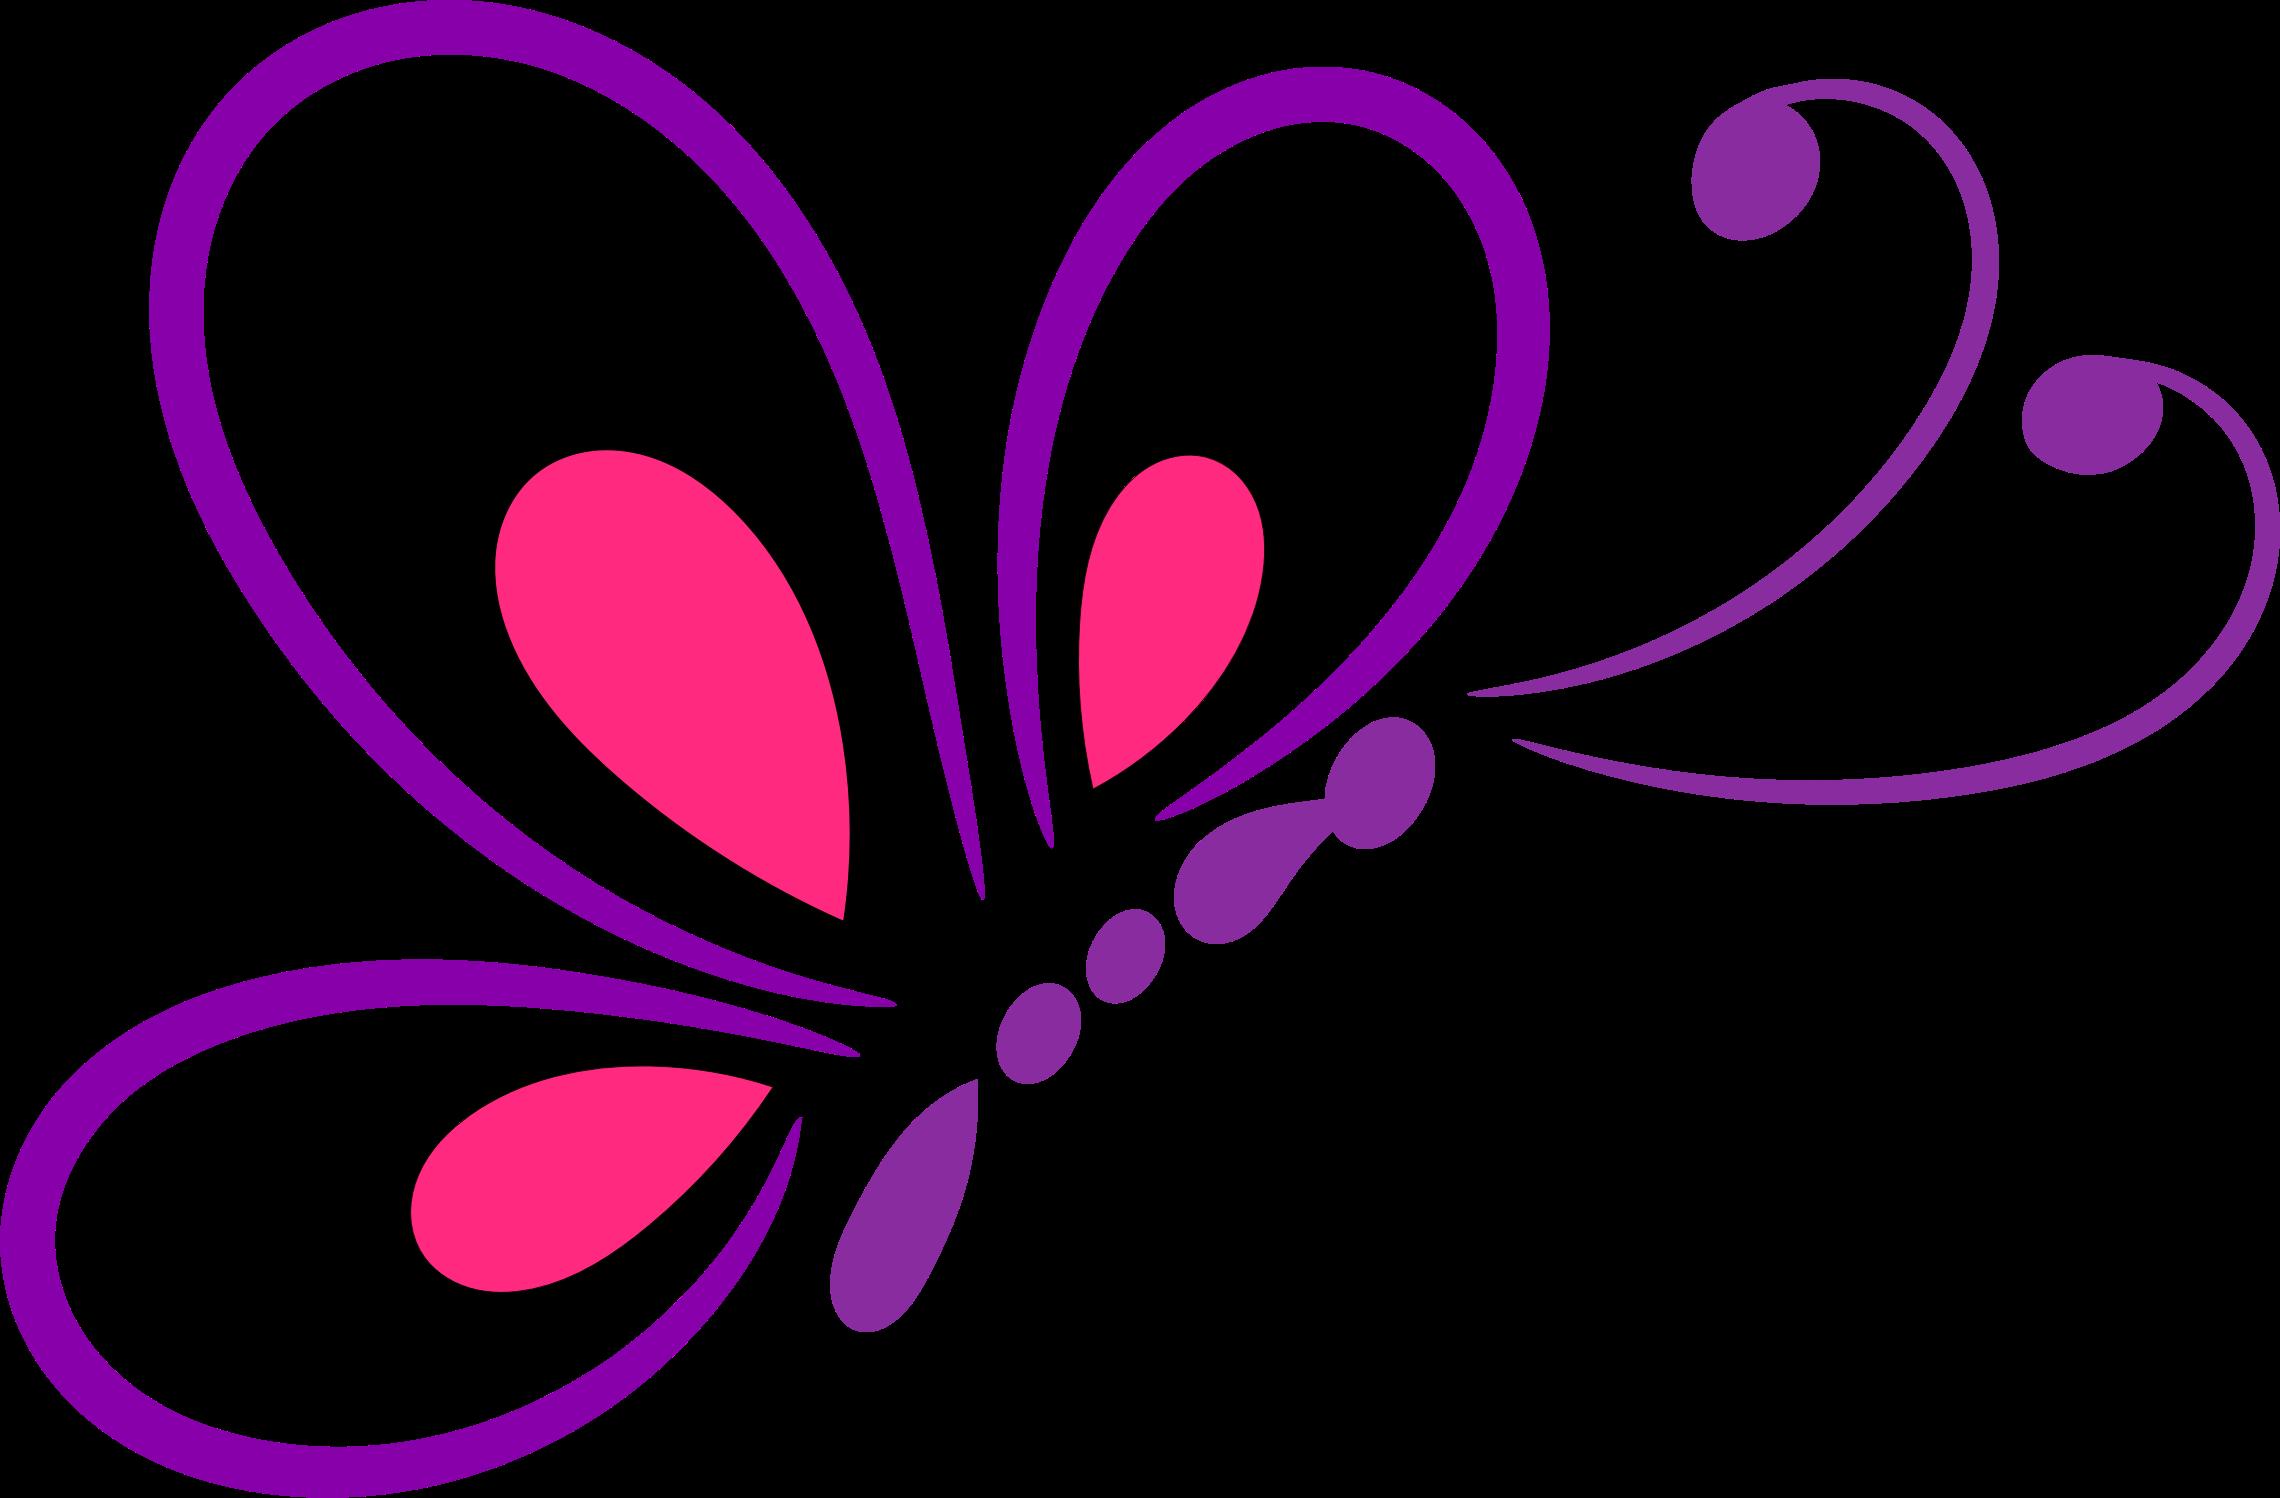 Line art big image. Heart clipart butterfly